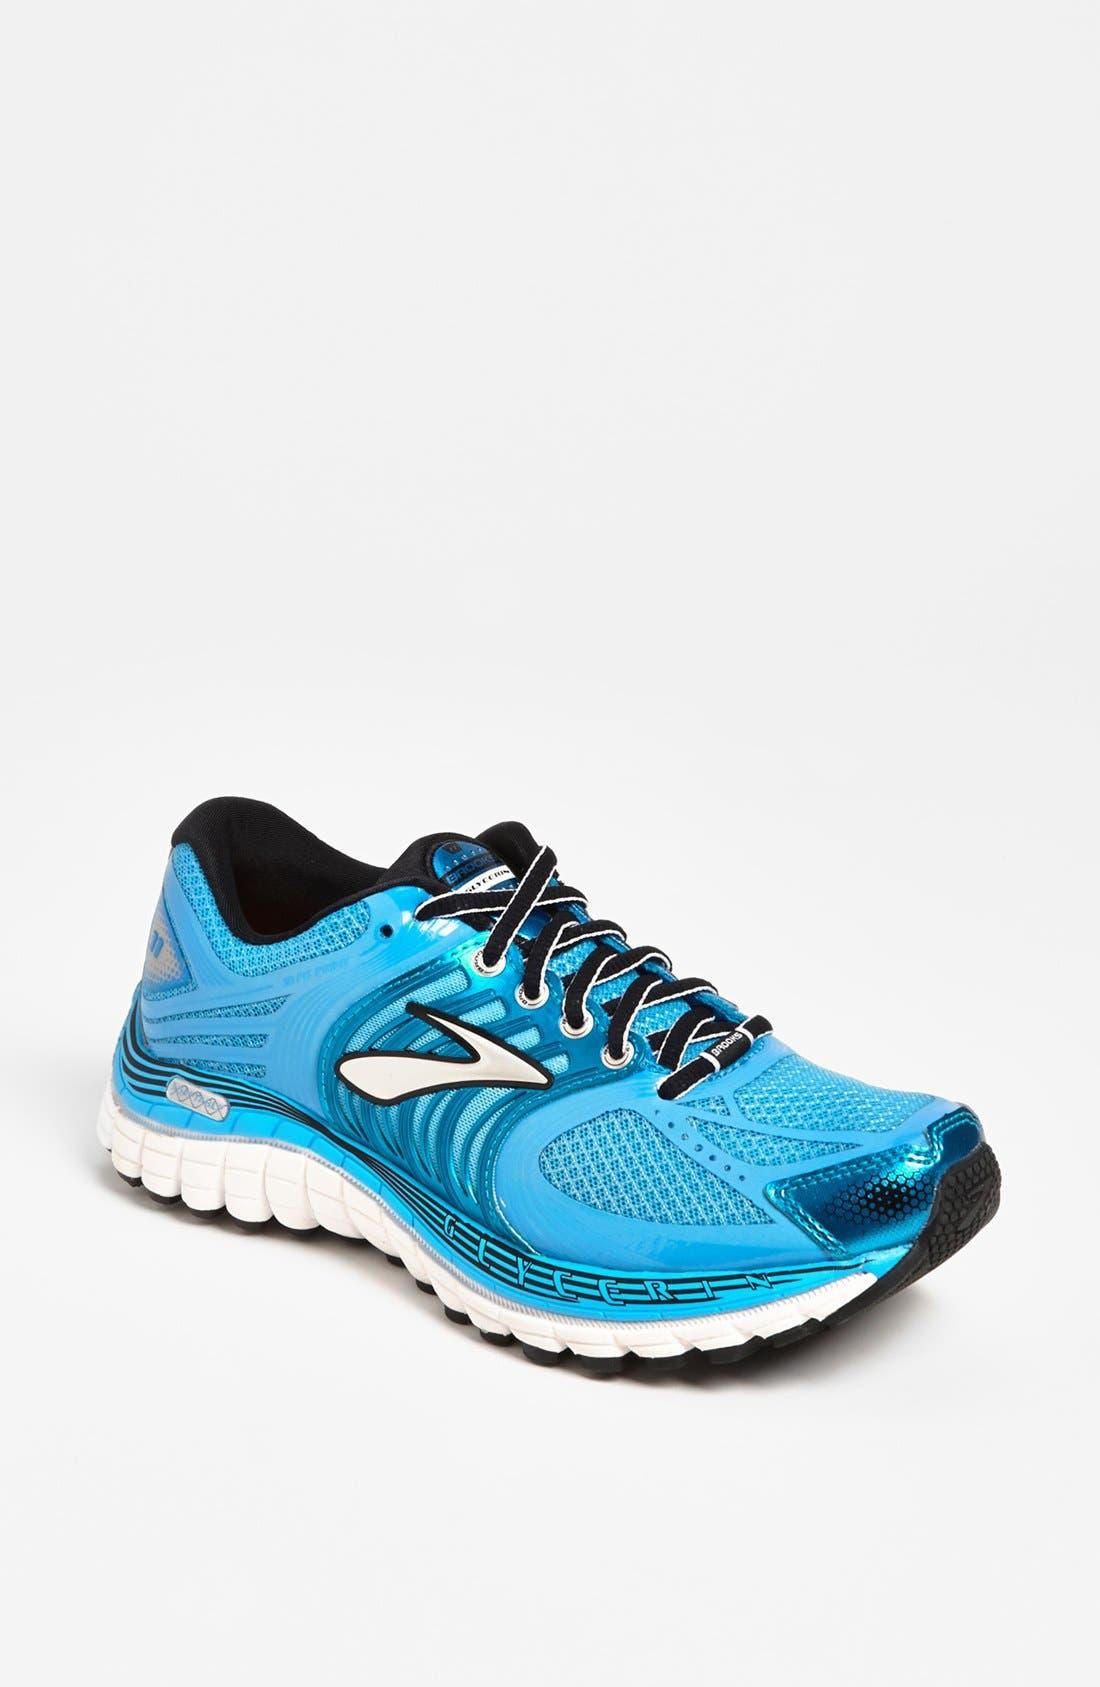 Alternate Image 1 Selected - Brooks 'Glycerin 11' Running Shoe (Women) (Regular Retail Price: $149.95)